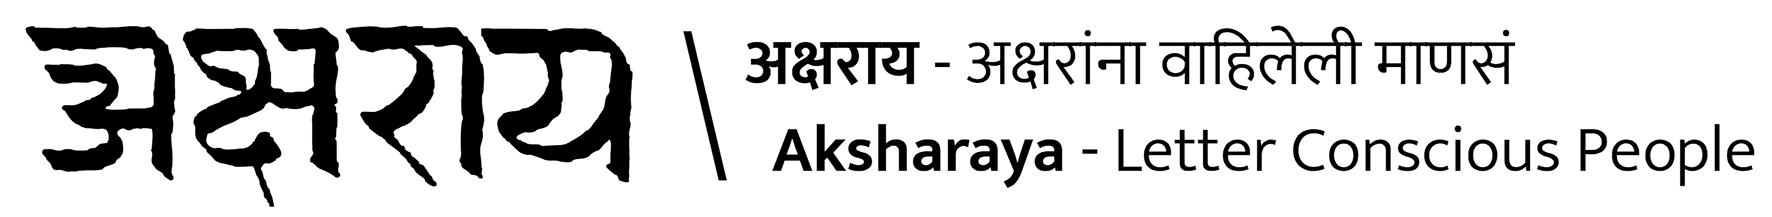 Aksharaya - Letter Conscious People